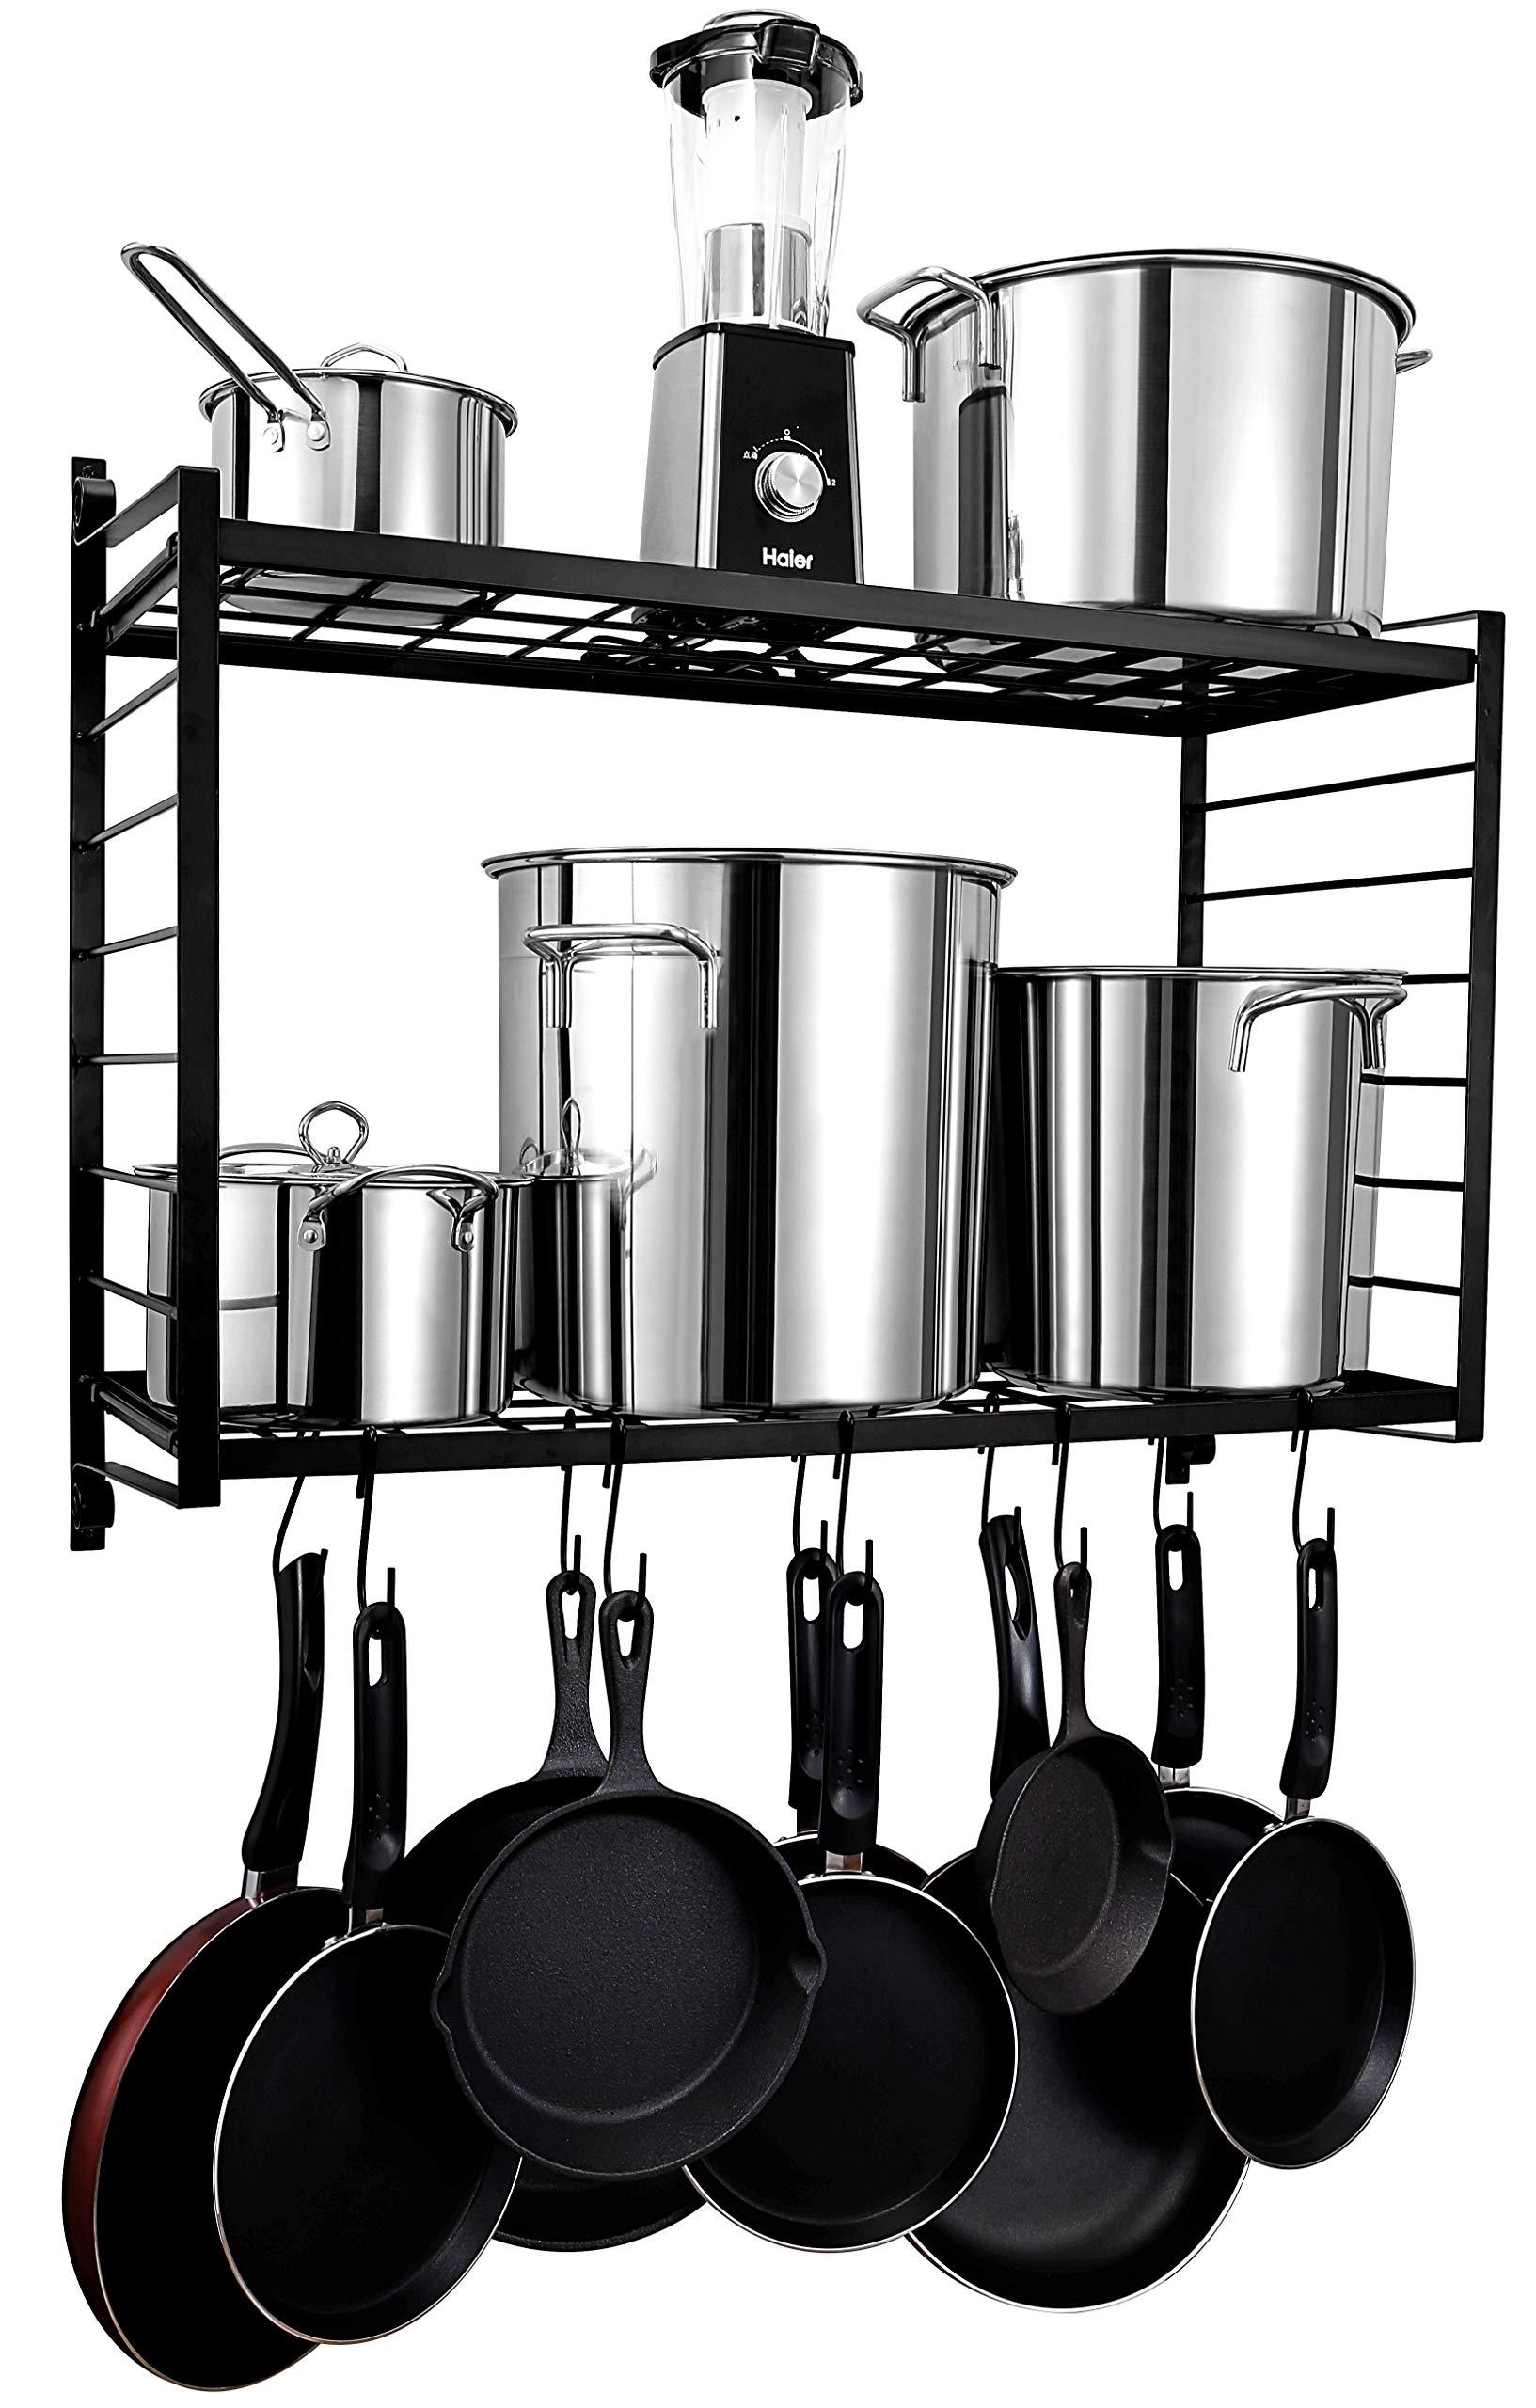 BestVida SparkWorks 2-Tiered Wall Mounted Pot Rack